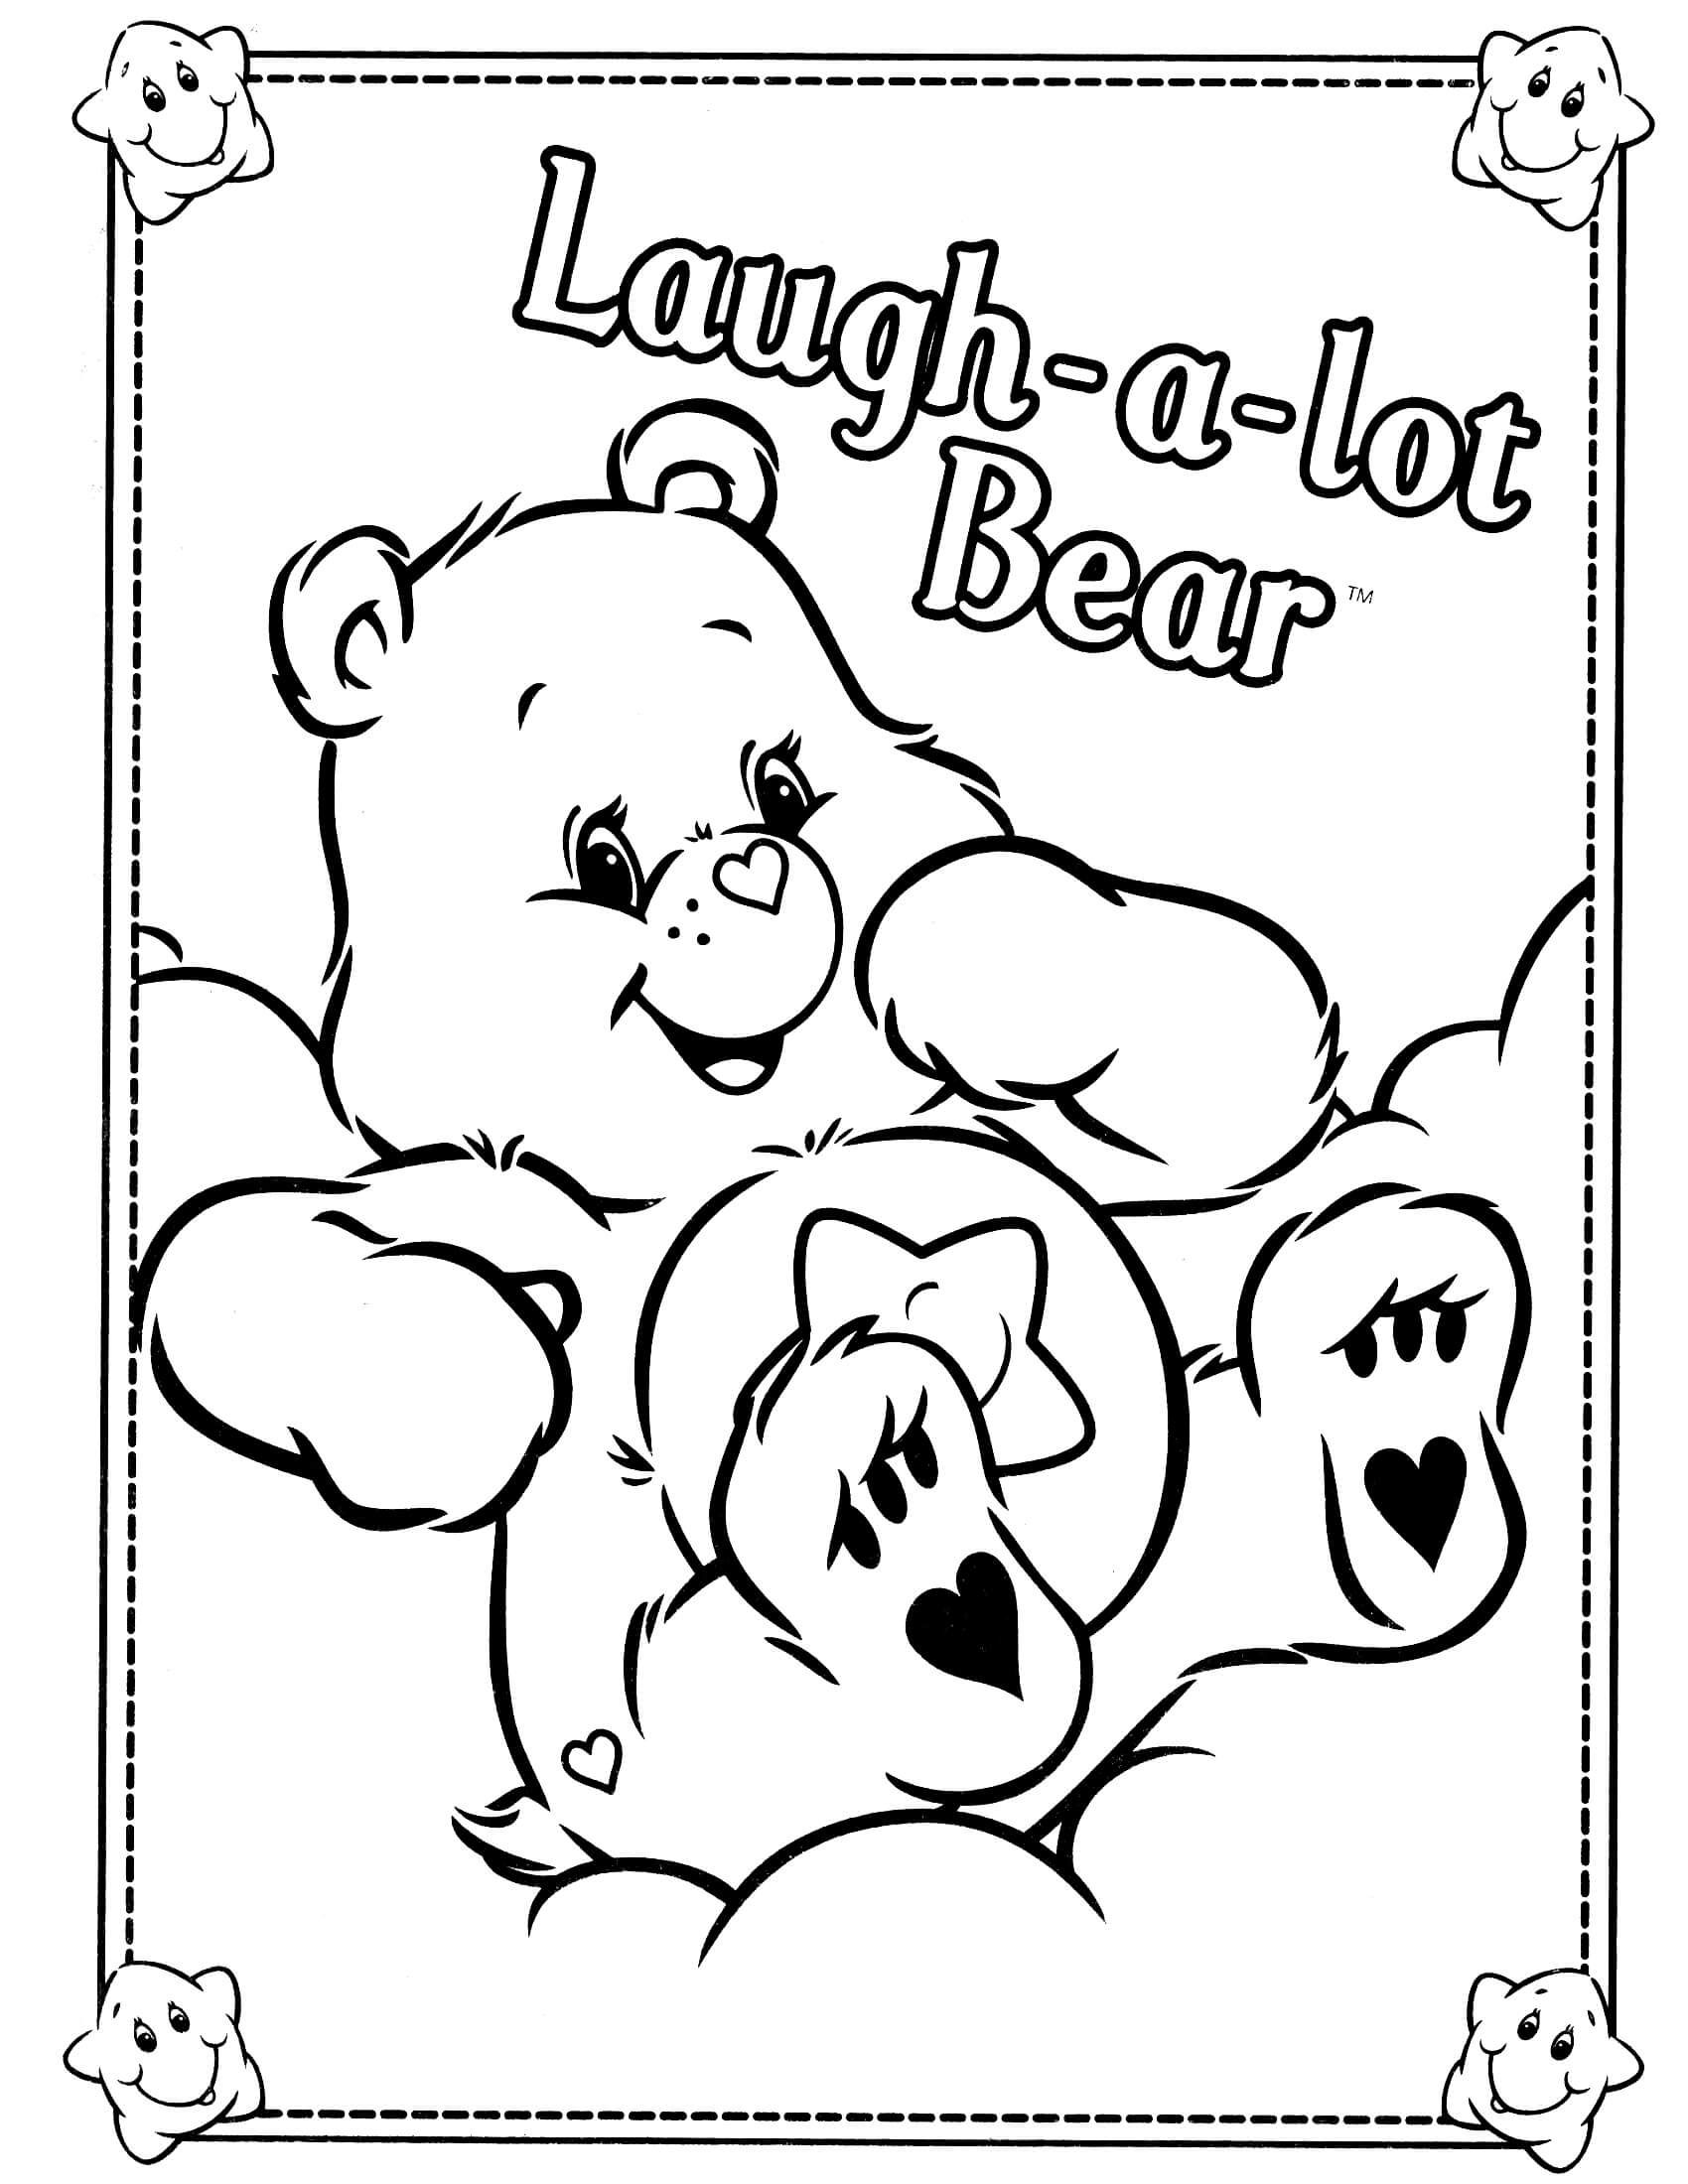 Laugh A Lot Bear Bear Coloring Pages Cartoon Coloring Pages Teddy Bear Coloring Pages